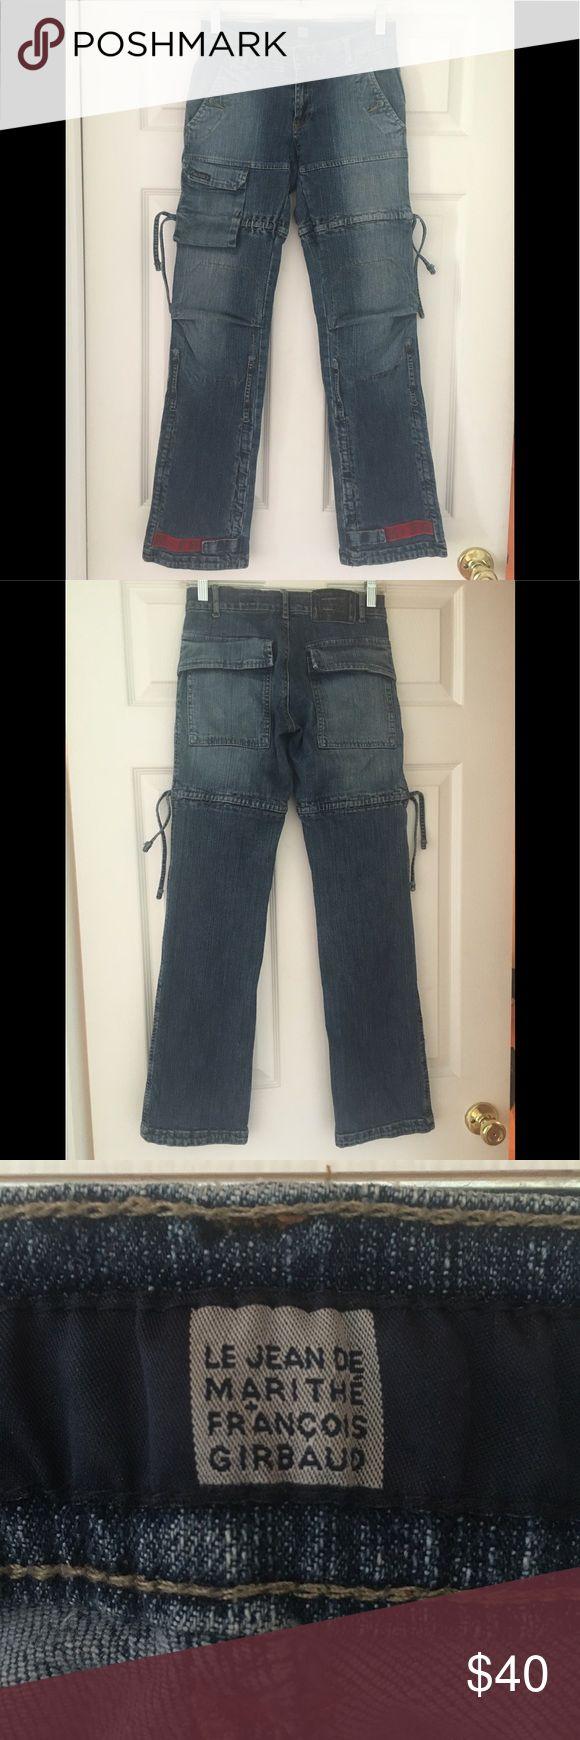 le jean de marithe francois girbaud jeans Rare le jean de marithe francois girbaud jeans in size 24 in great condition. Jeans Boyfriend